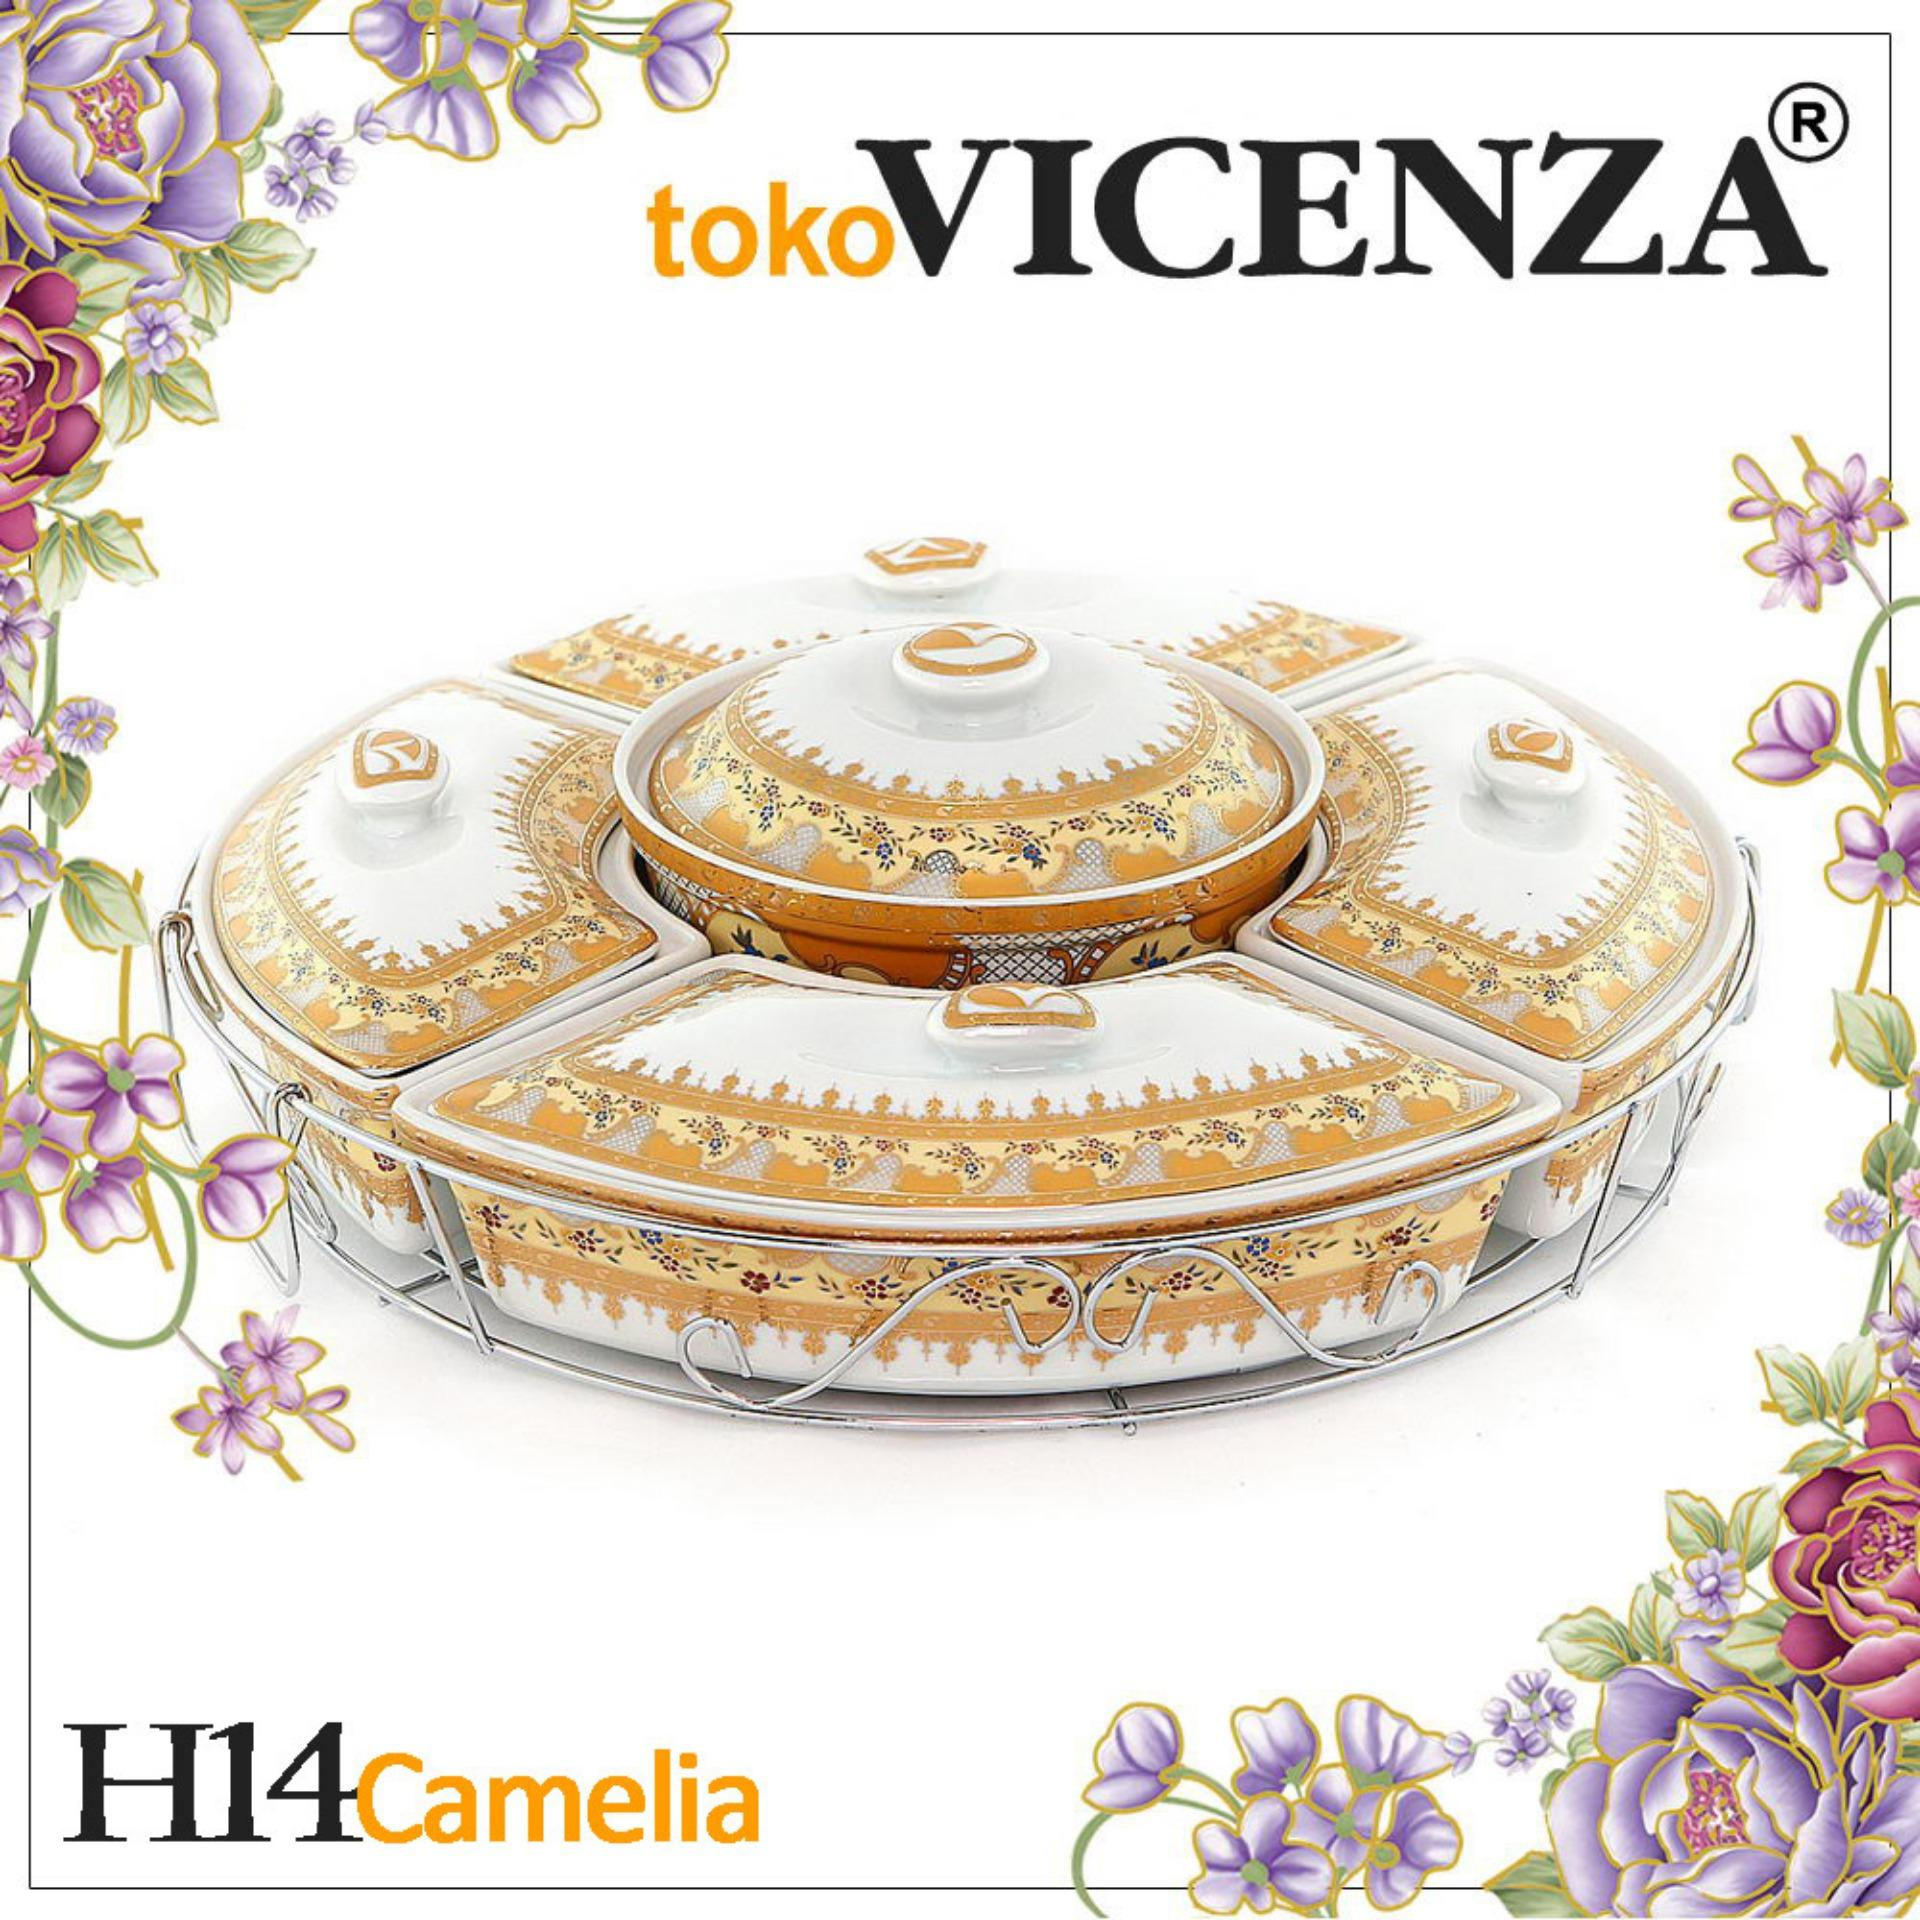 Vicenza Prasmanan Snack H14  Garansi Pecah Motif Camelia